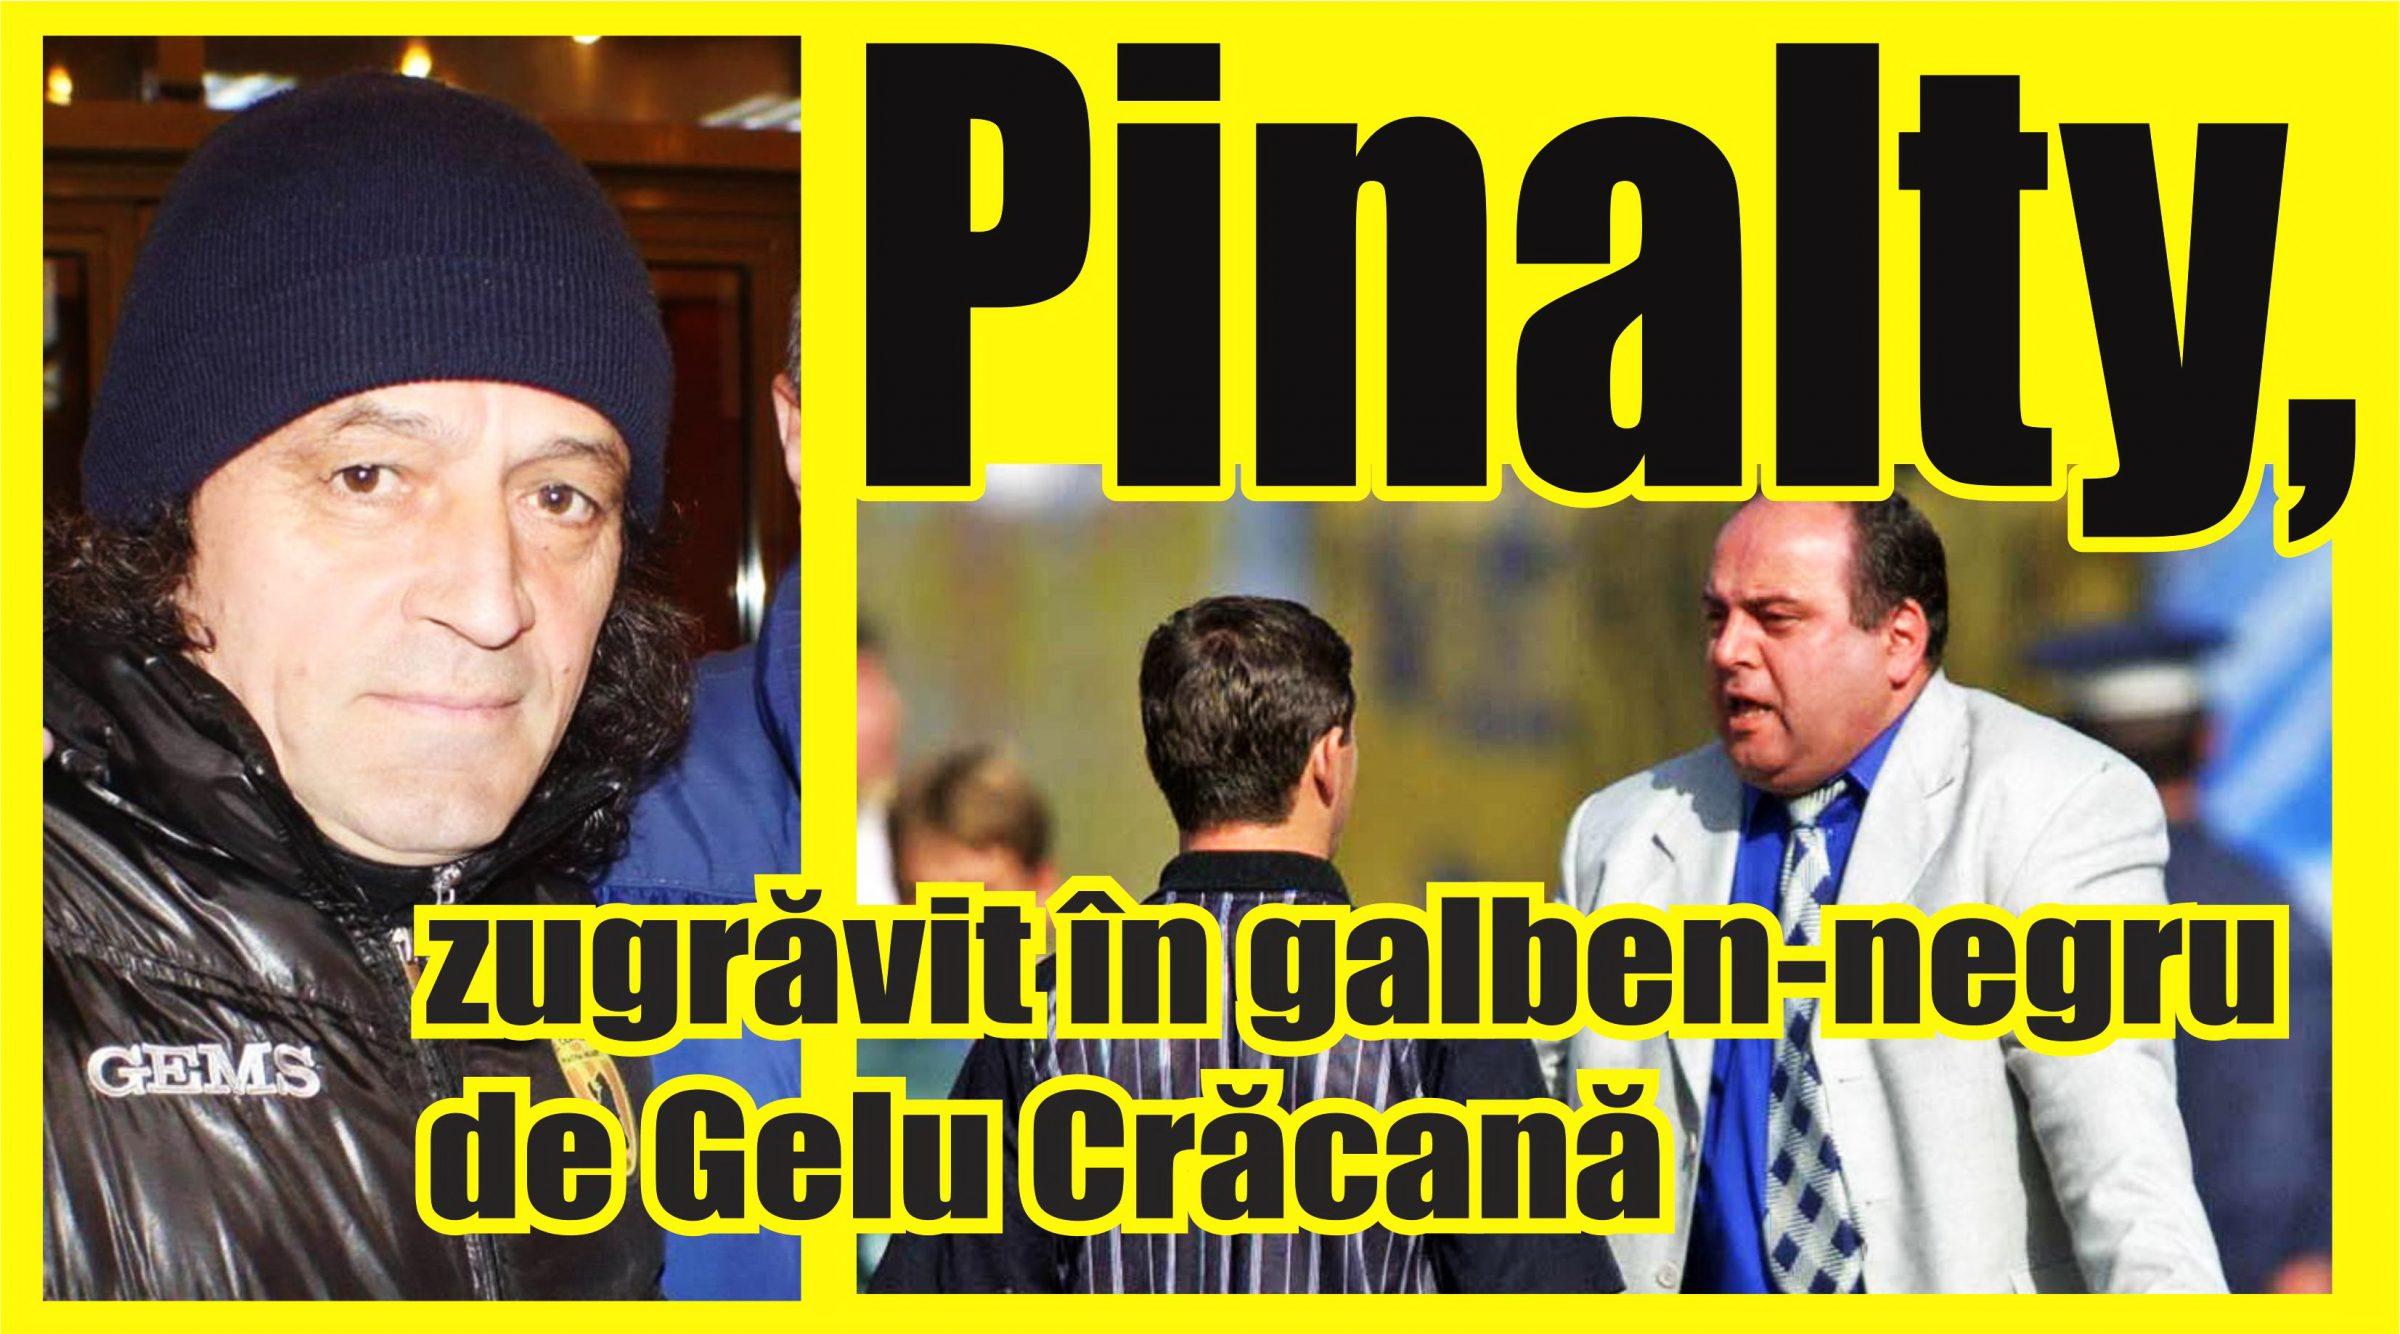 cop-cracana